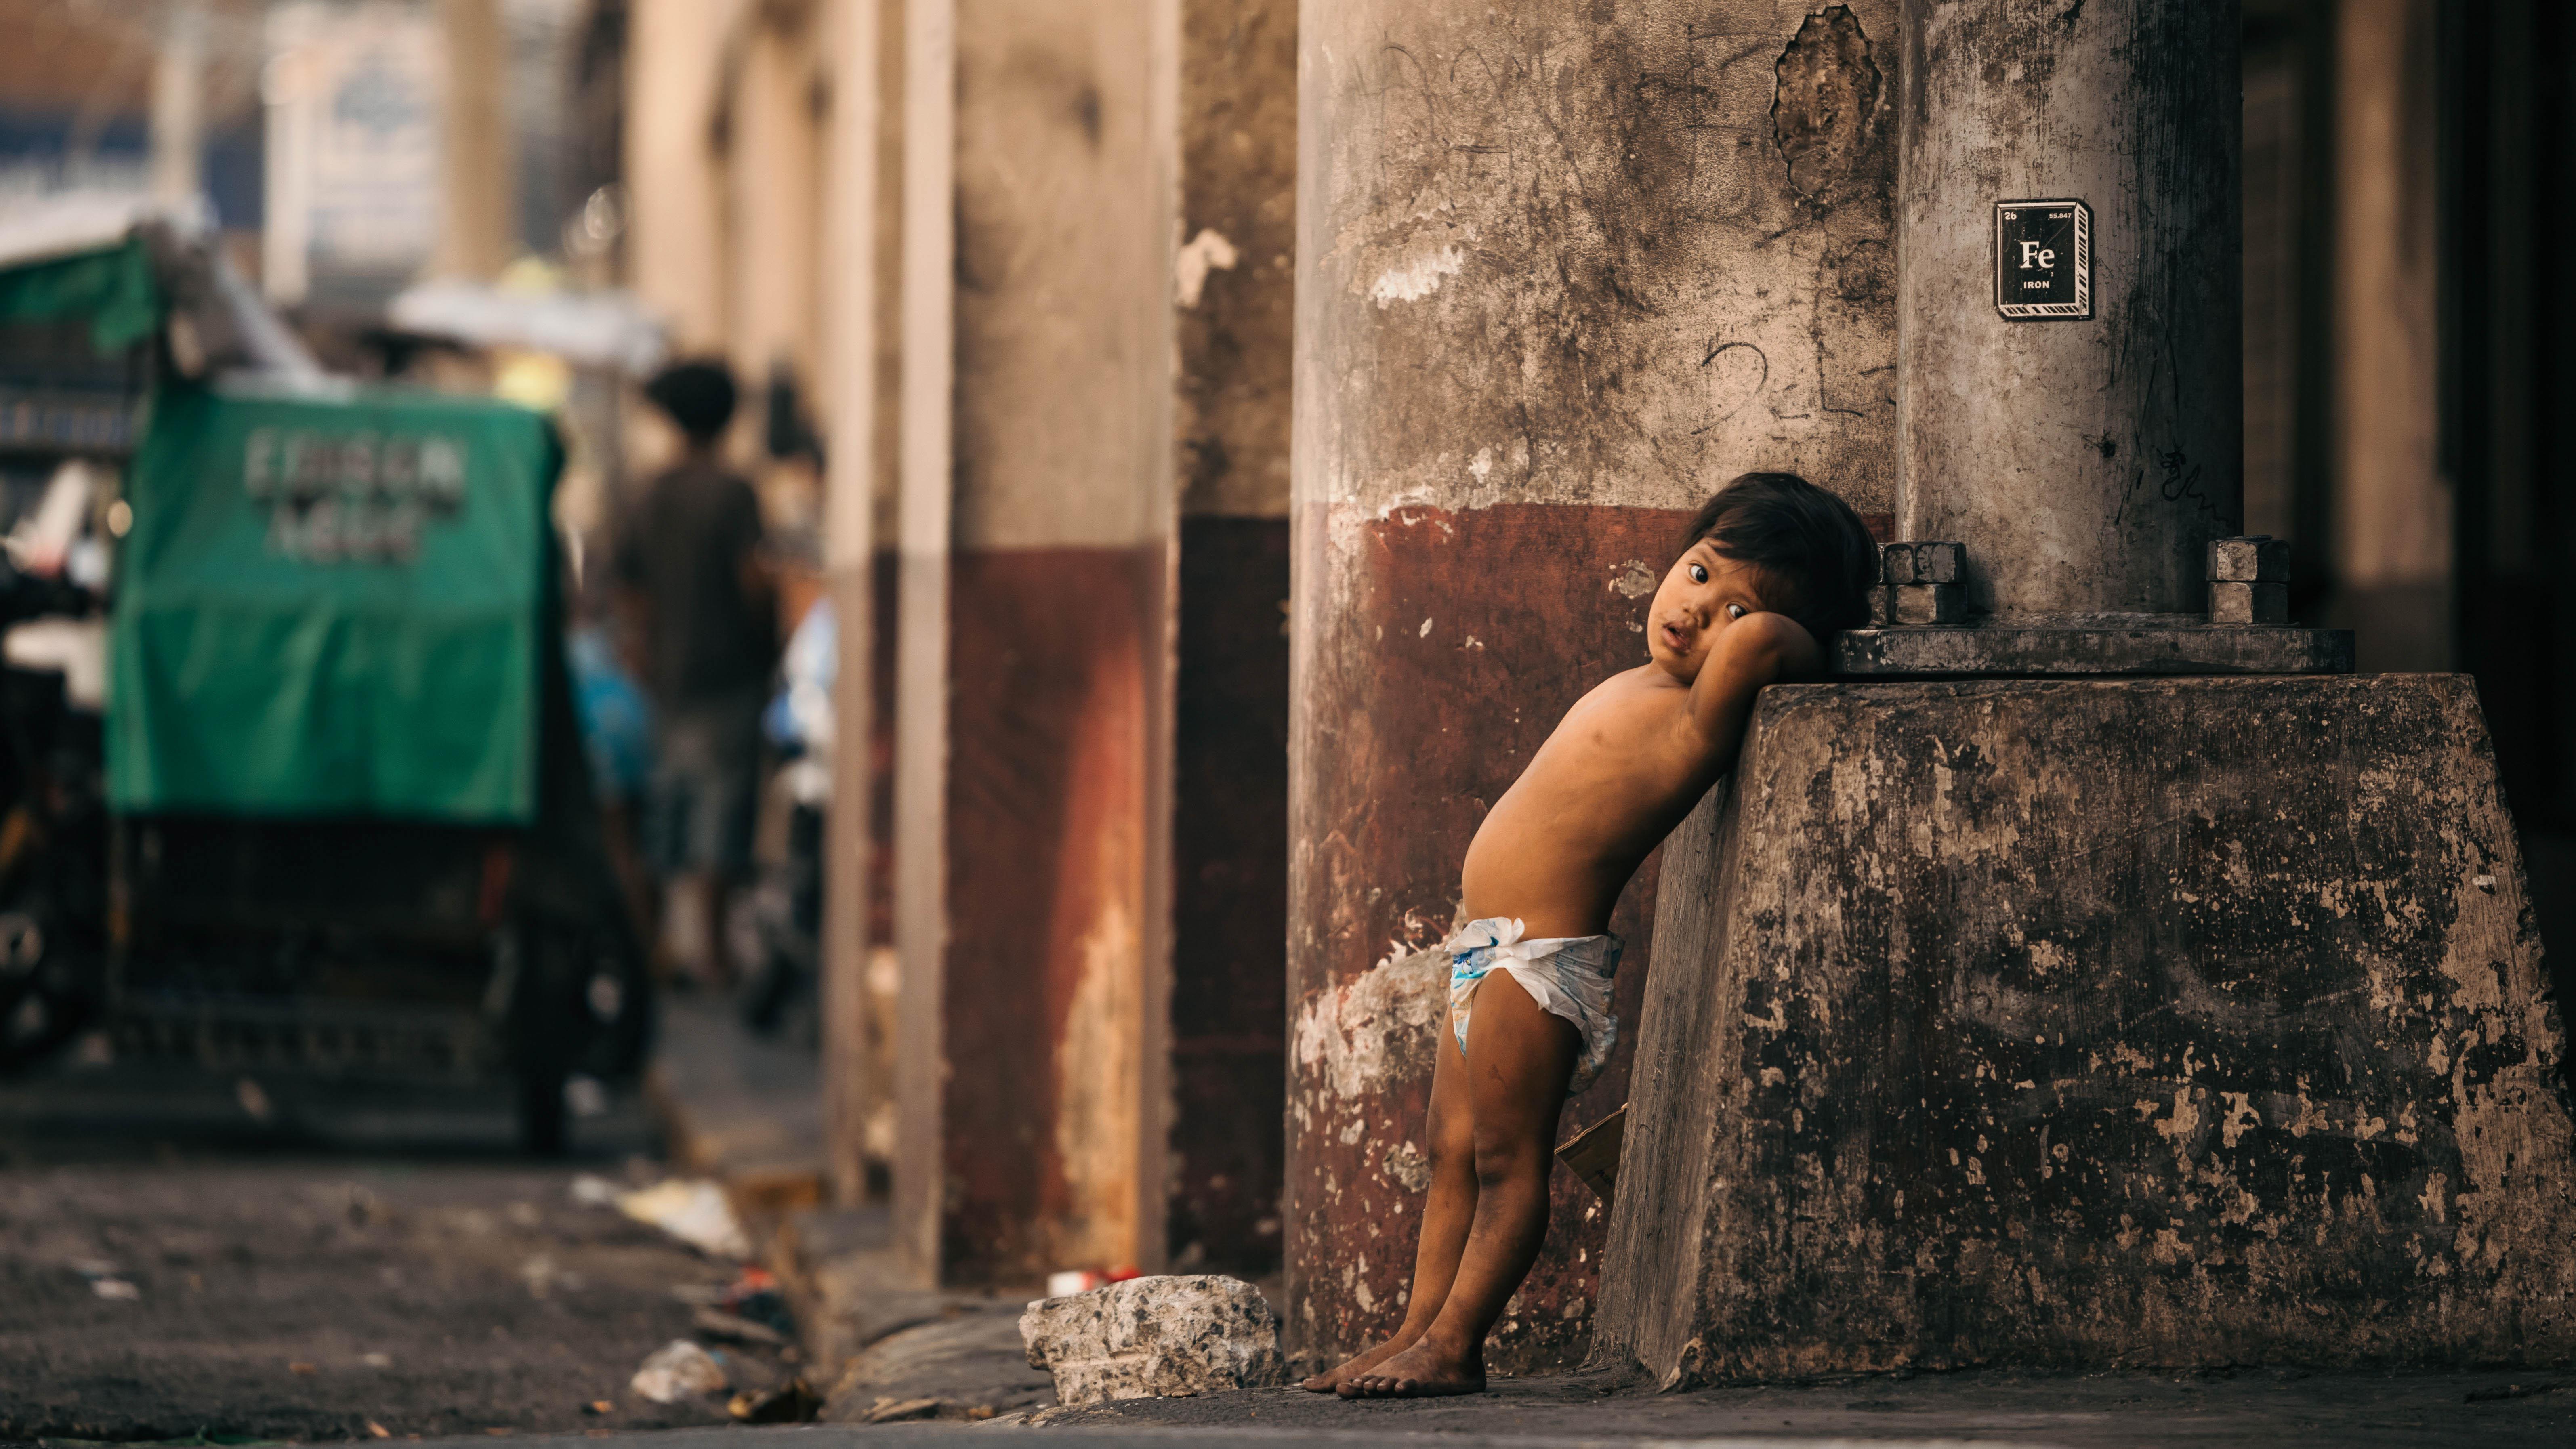 nikkei.com - MIKHAIL FLORES - Chronic malnutrition stunts Asia's rising-star economies